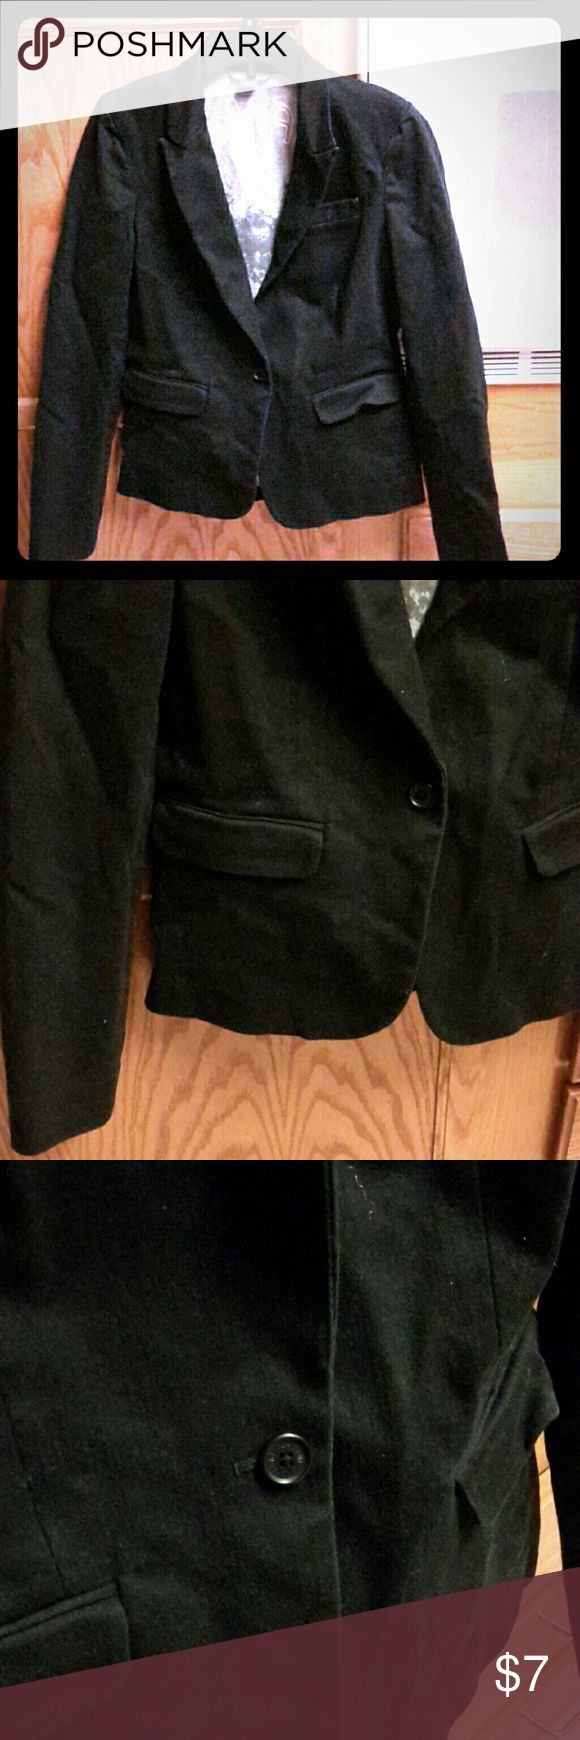 Selling this Jacket on Poshmark! My username is: jazzyfizzle1001. #shopmycloset #poshmark #fashion #shopping #style #forsale #Armani Exchange #Jackets & Blazers